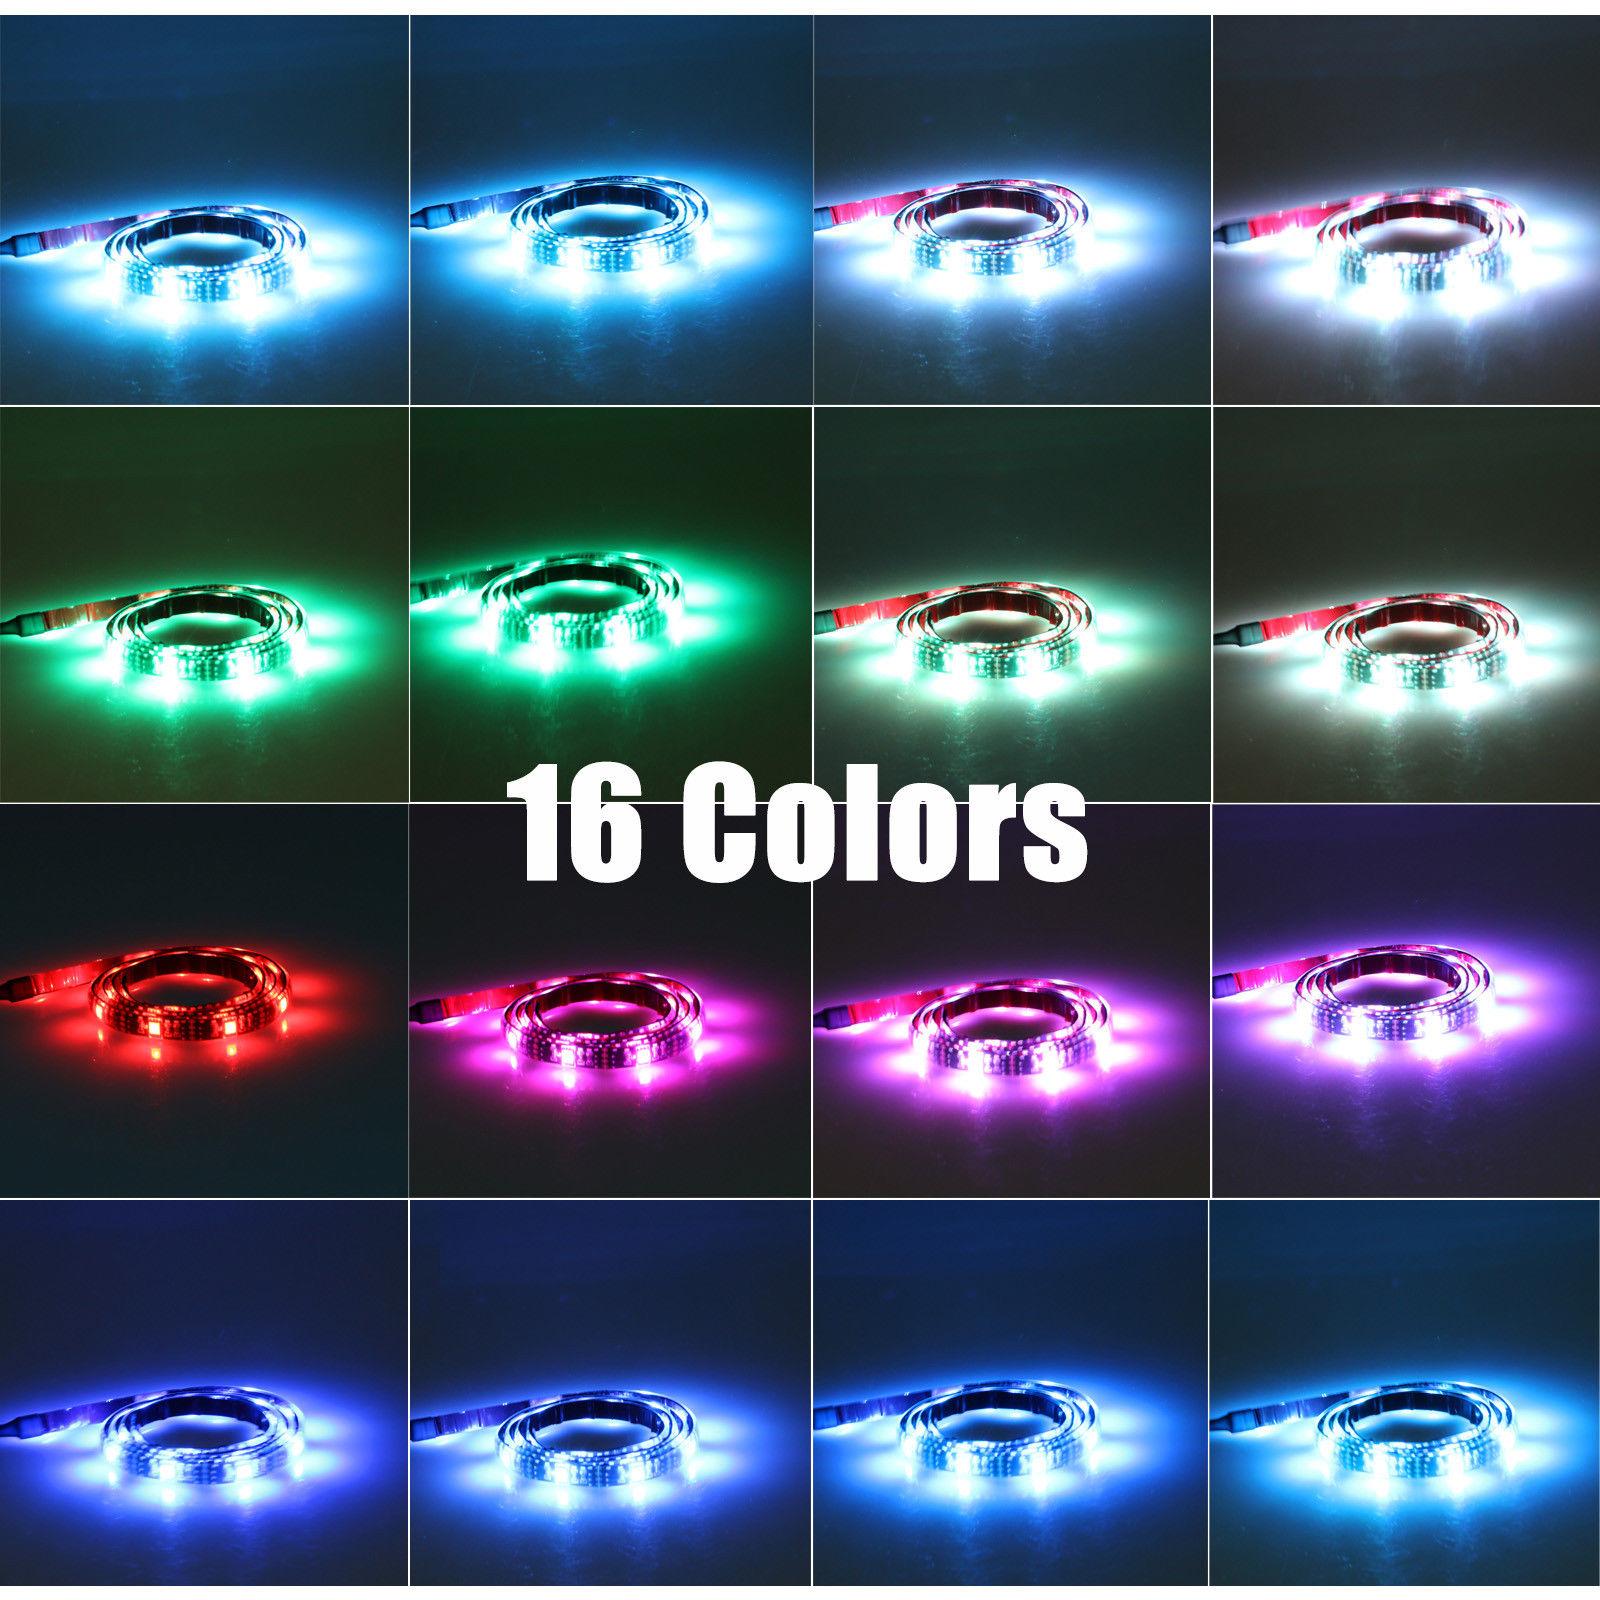 USB-Powered-RGB-5050-LED-Strip-Light-TV-  sc 1 st  eBay & USB Powered RGB 5050 LED Strip Light TV Computer Background ... azcodes.com